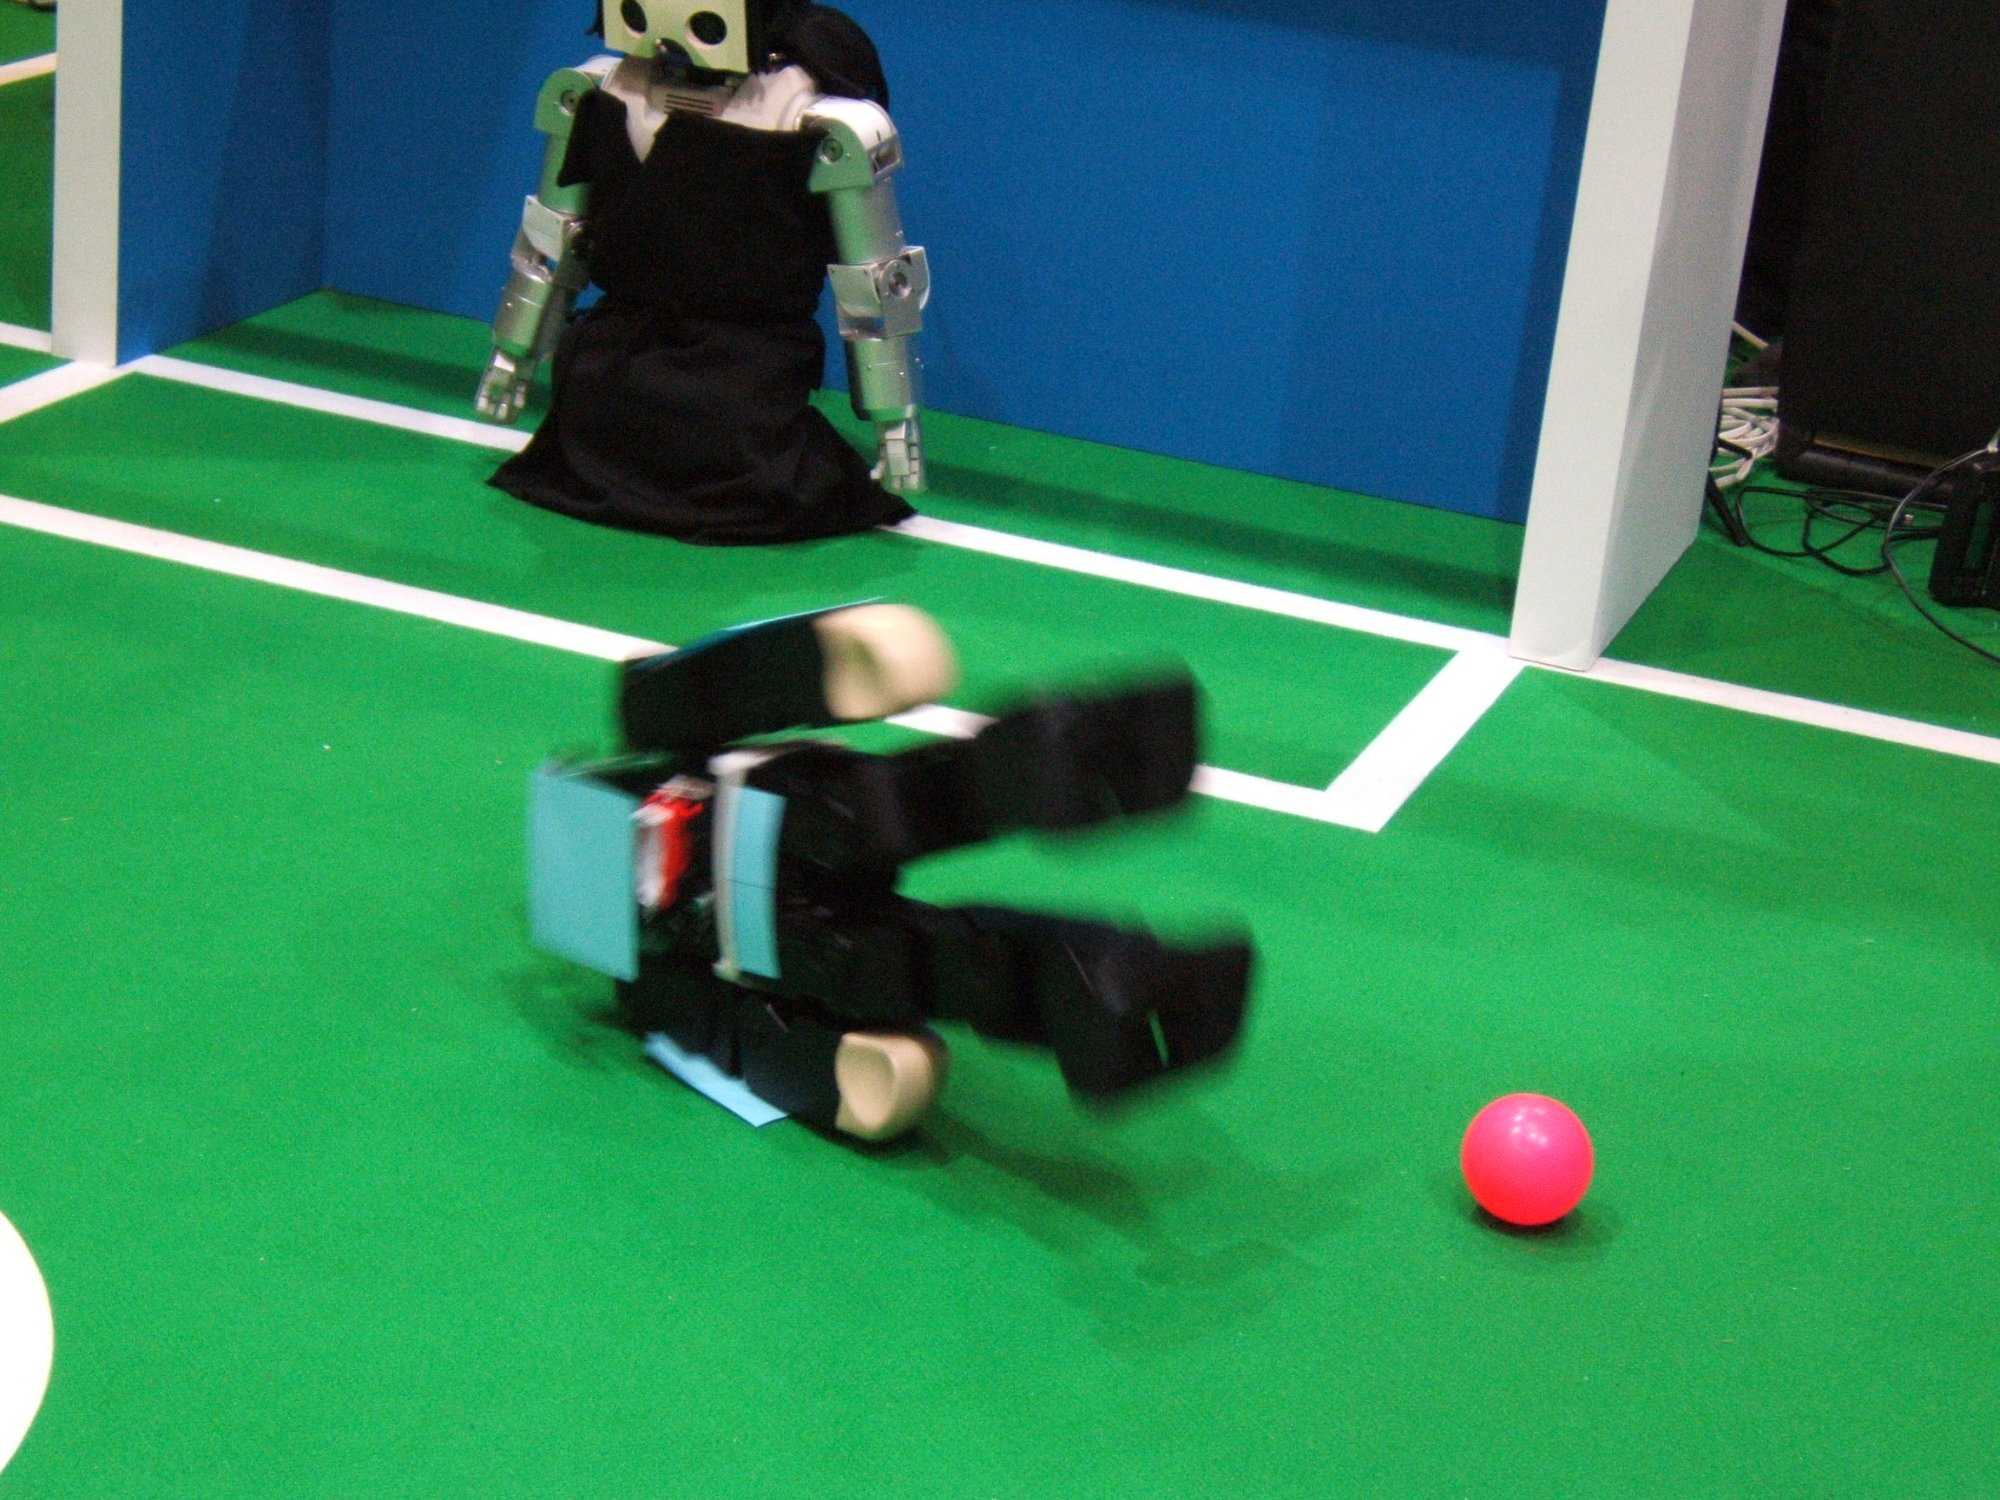 Der humanoide Roboter Vision Nexta stürzt